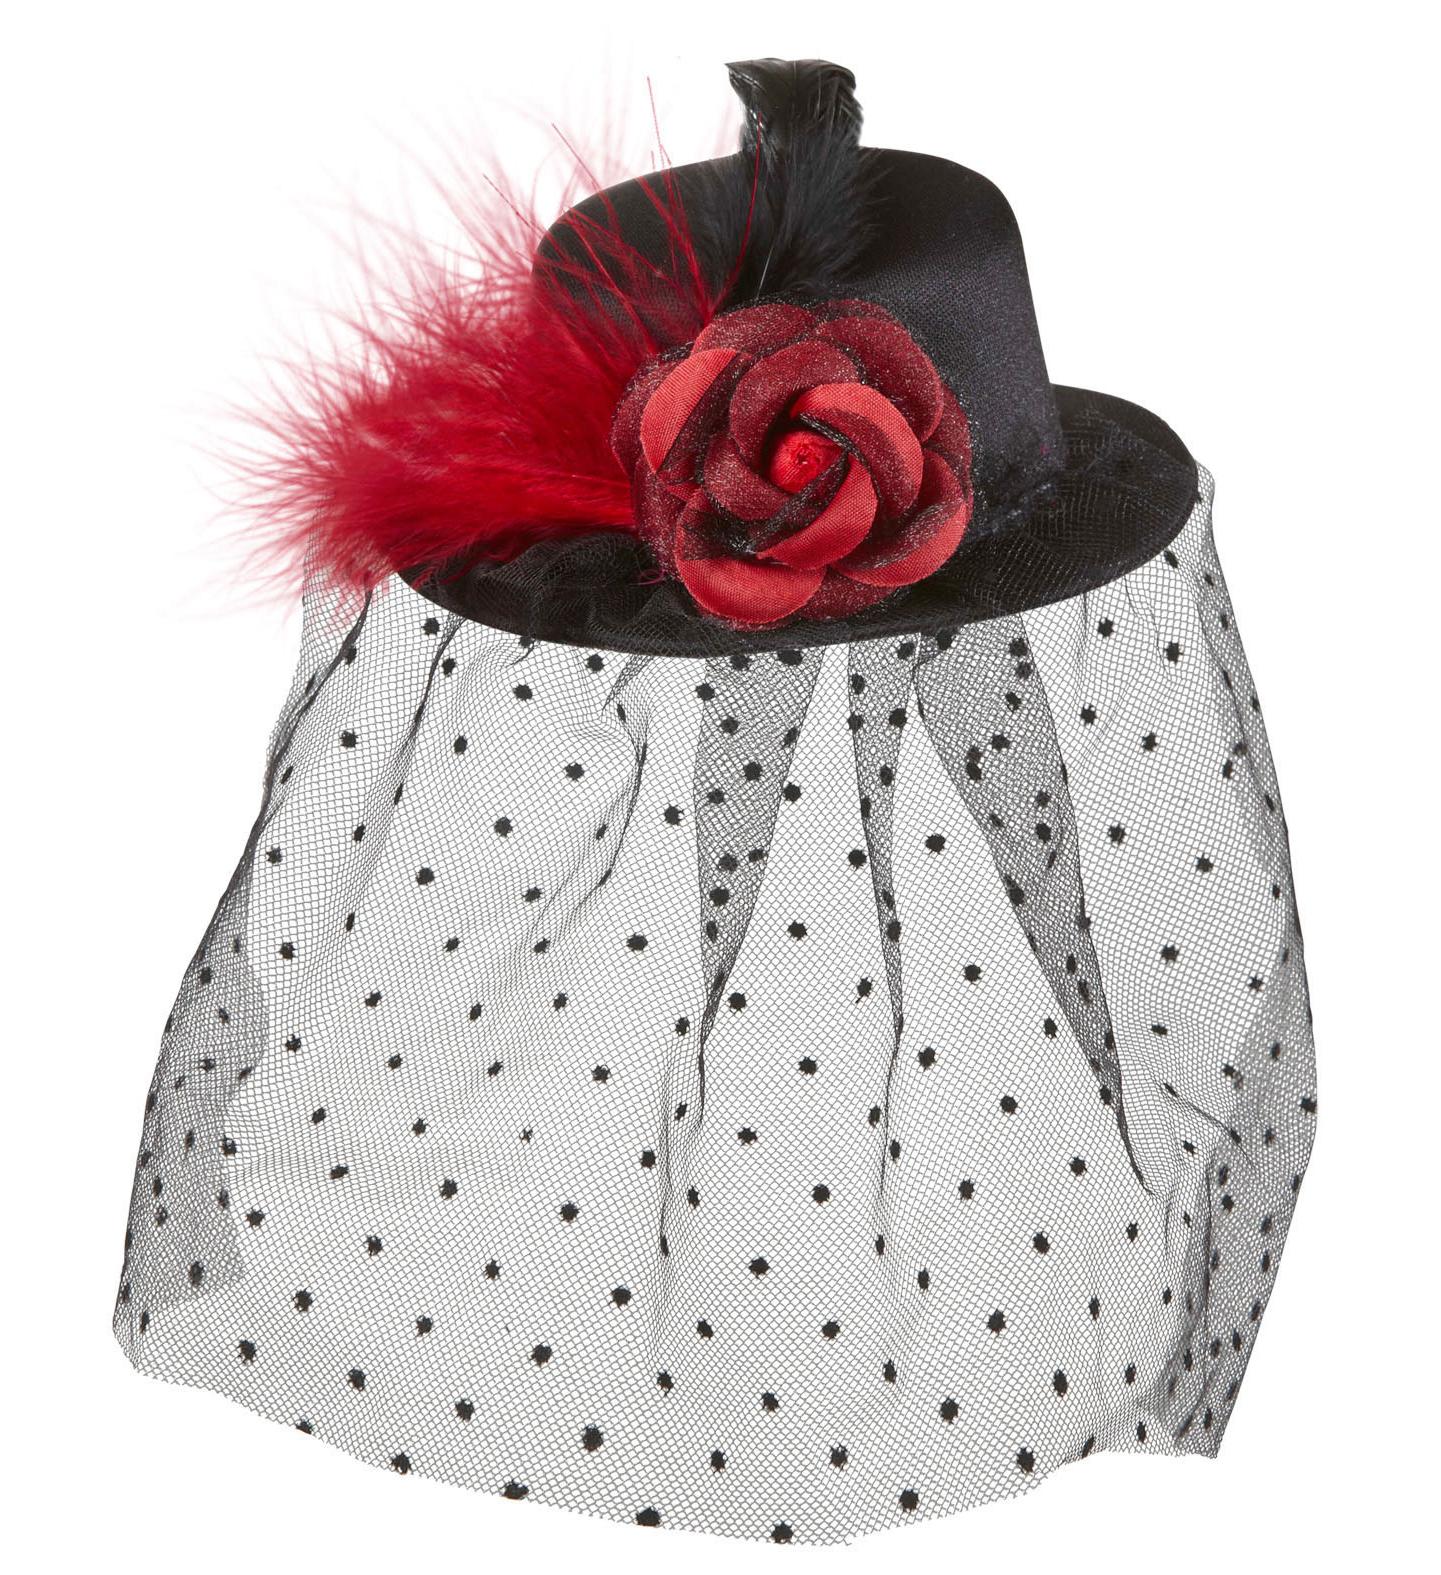 Black Mini Top Hat with Rose Tulle Veil 20s 30s Fancy Dress